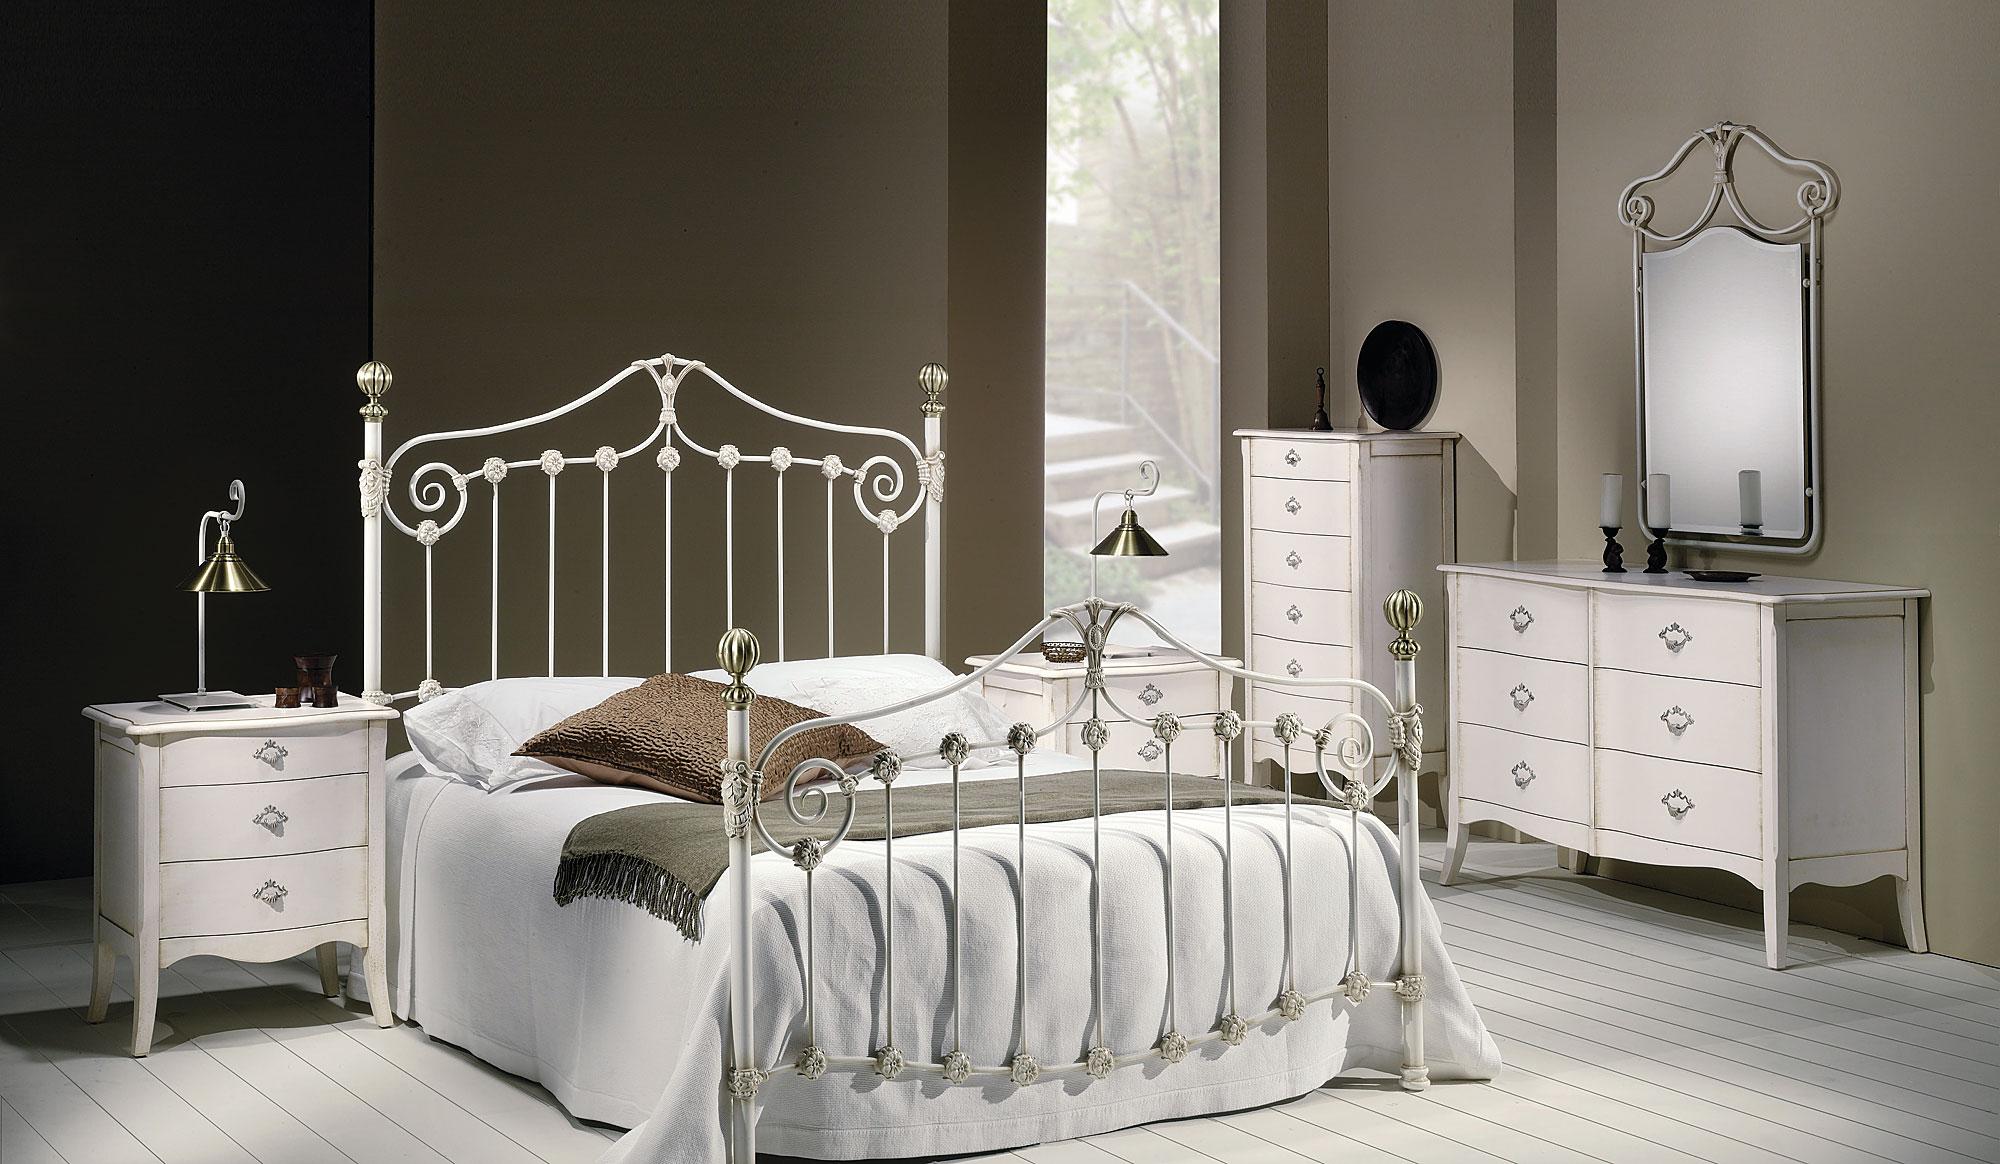 Dormitorio forja vals de lujo en tu - Muebles en forja ...